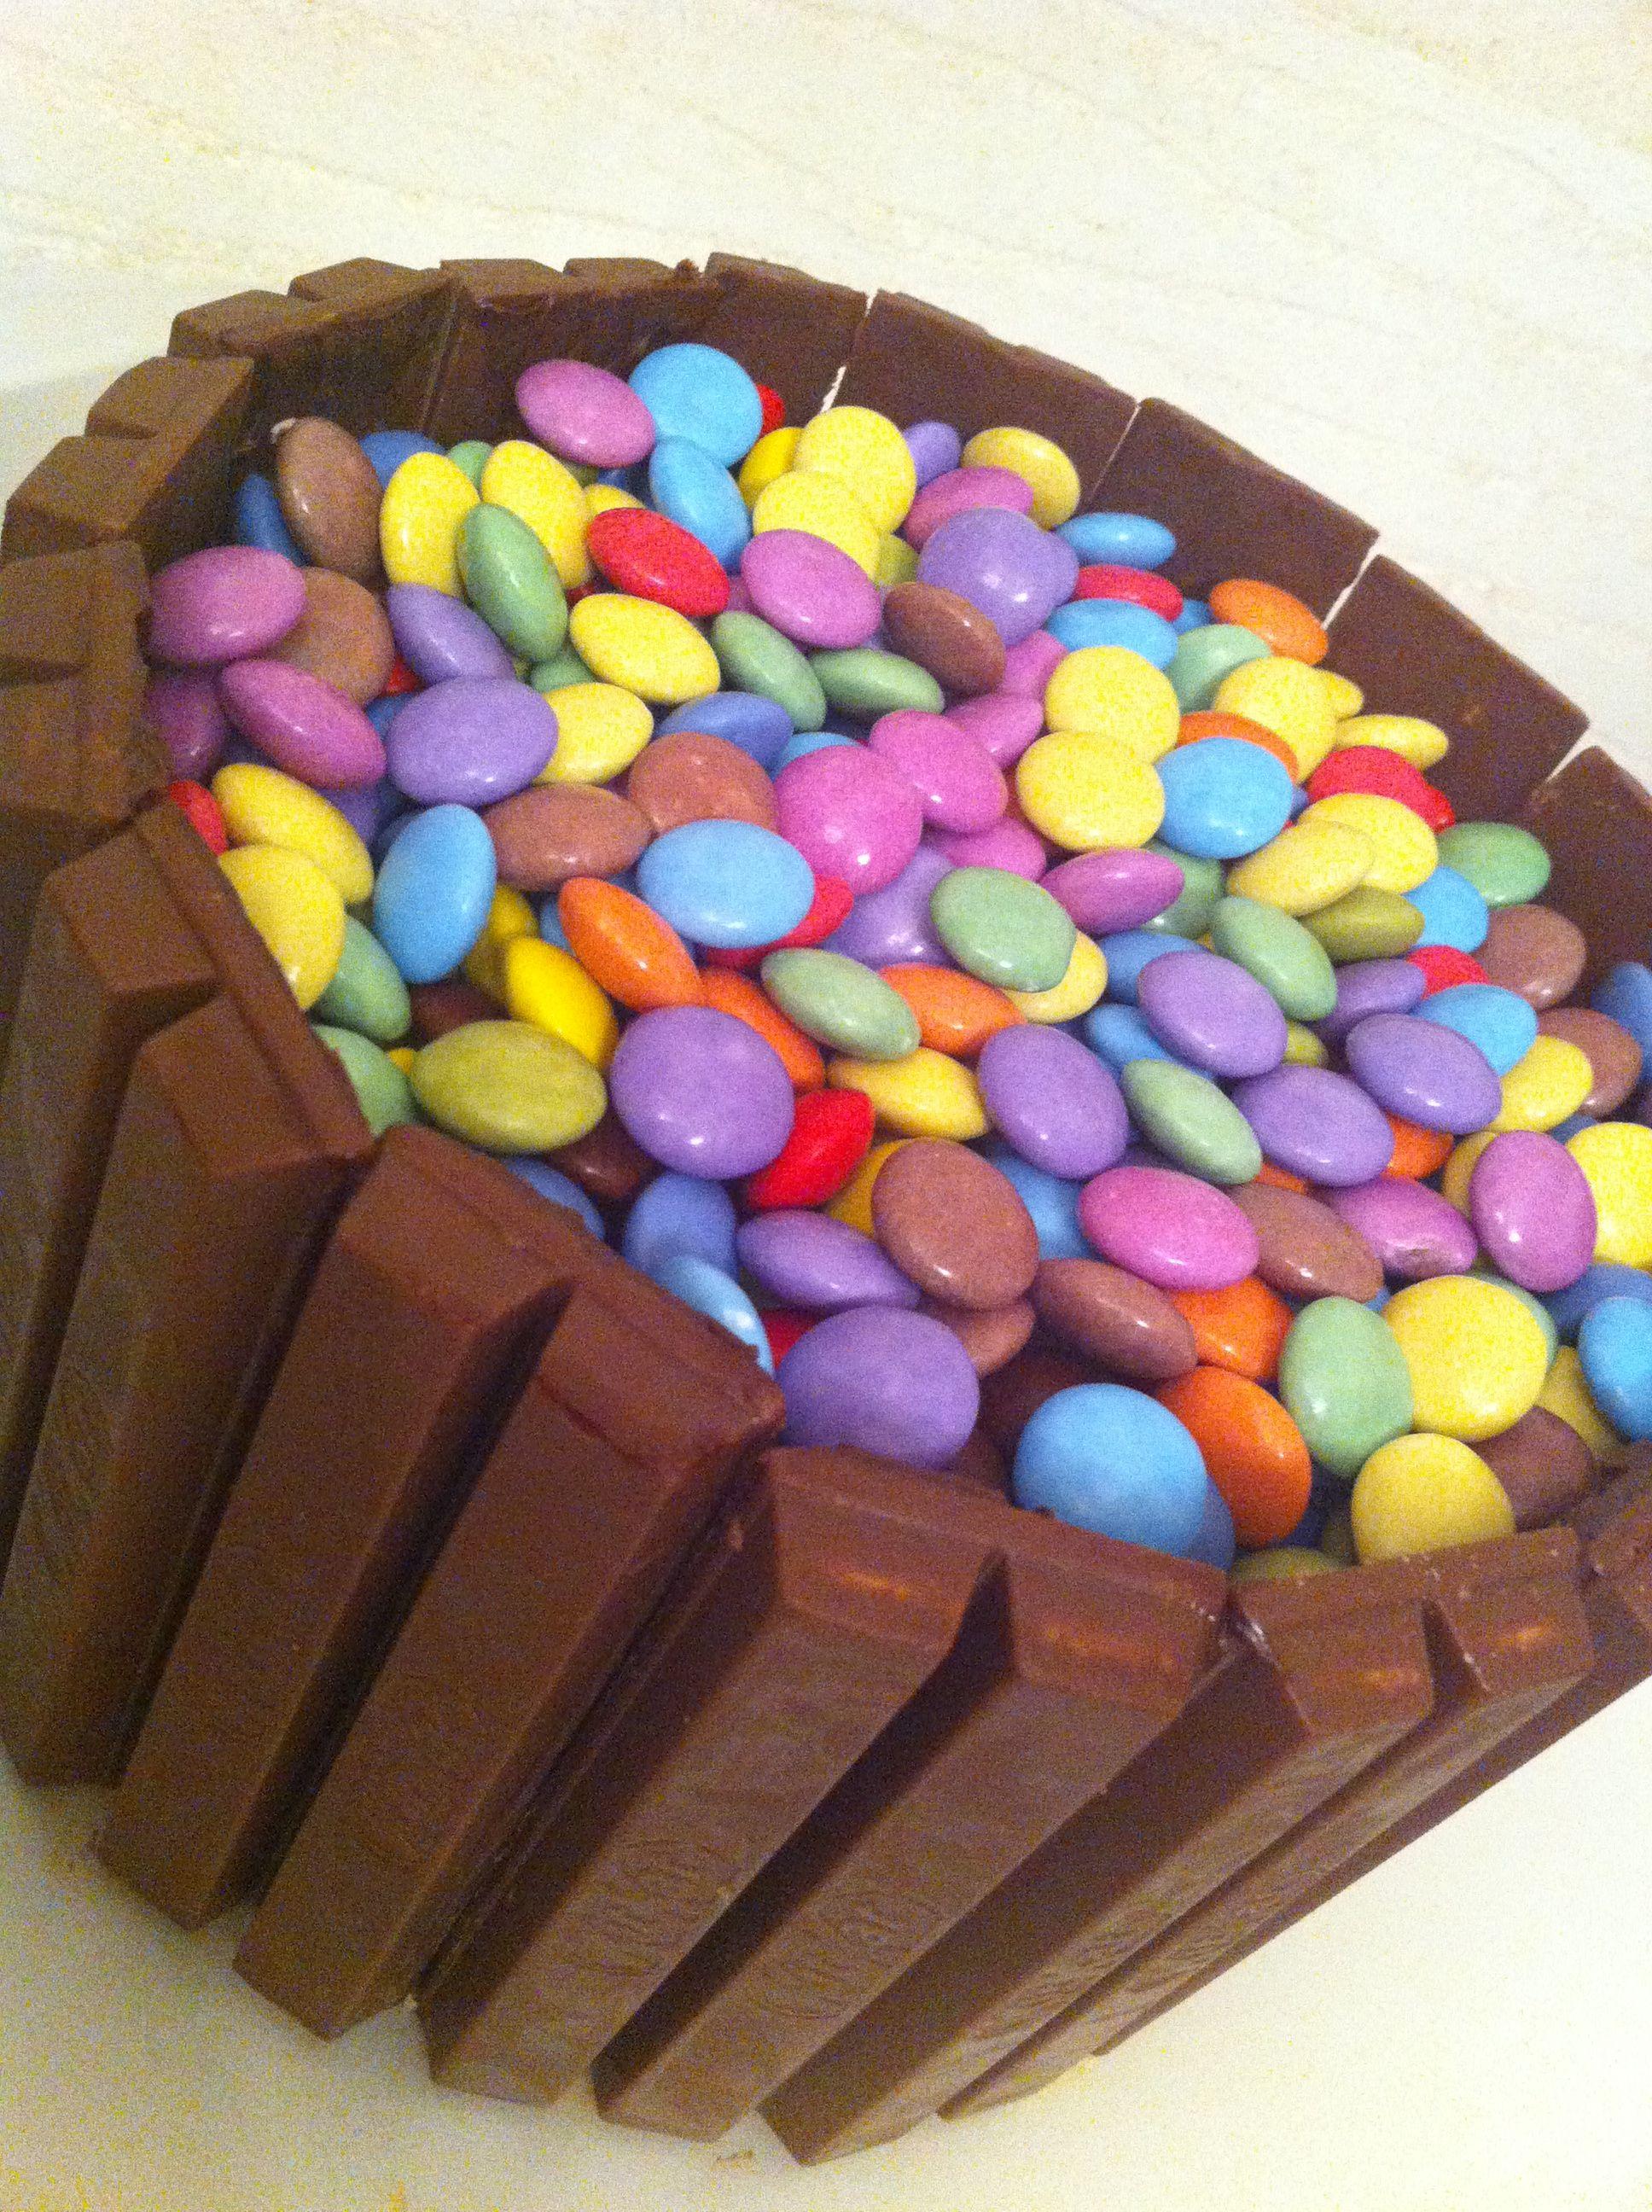 KitKat + Smartie cake